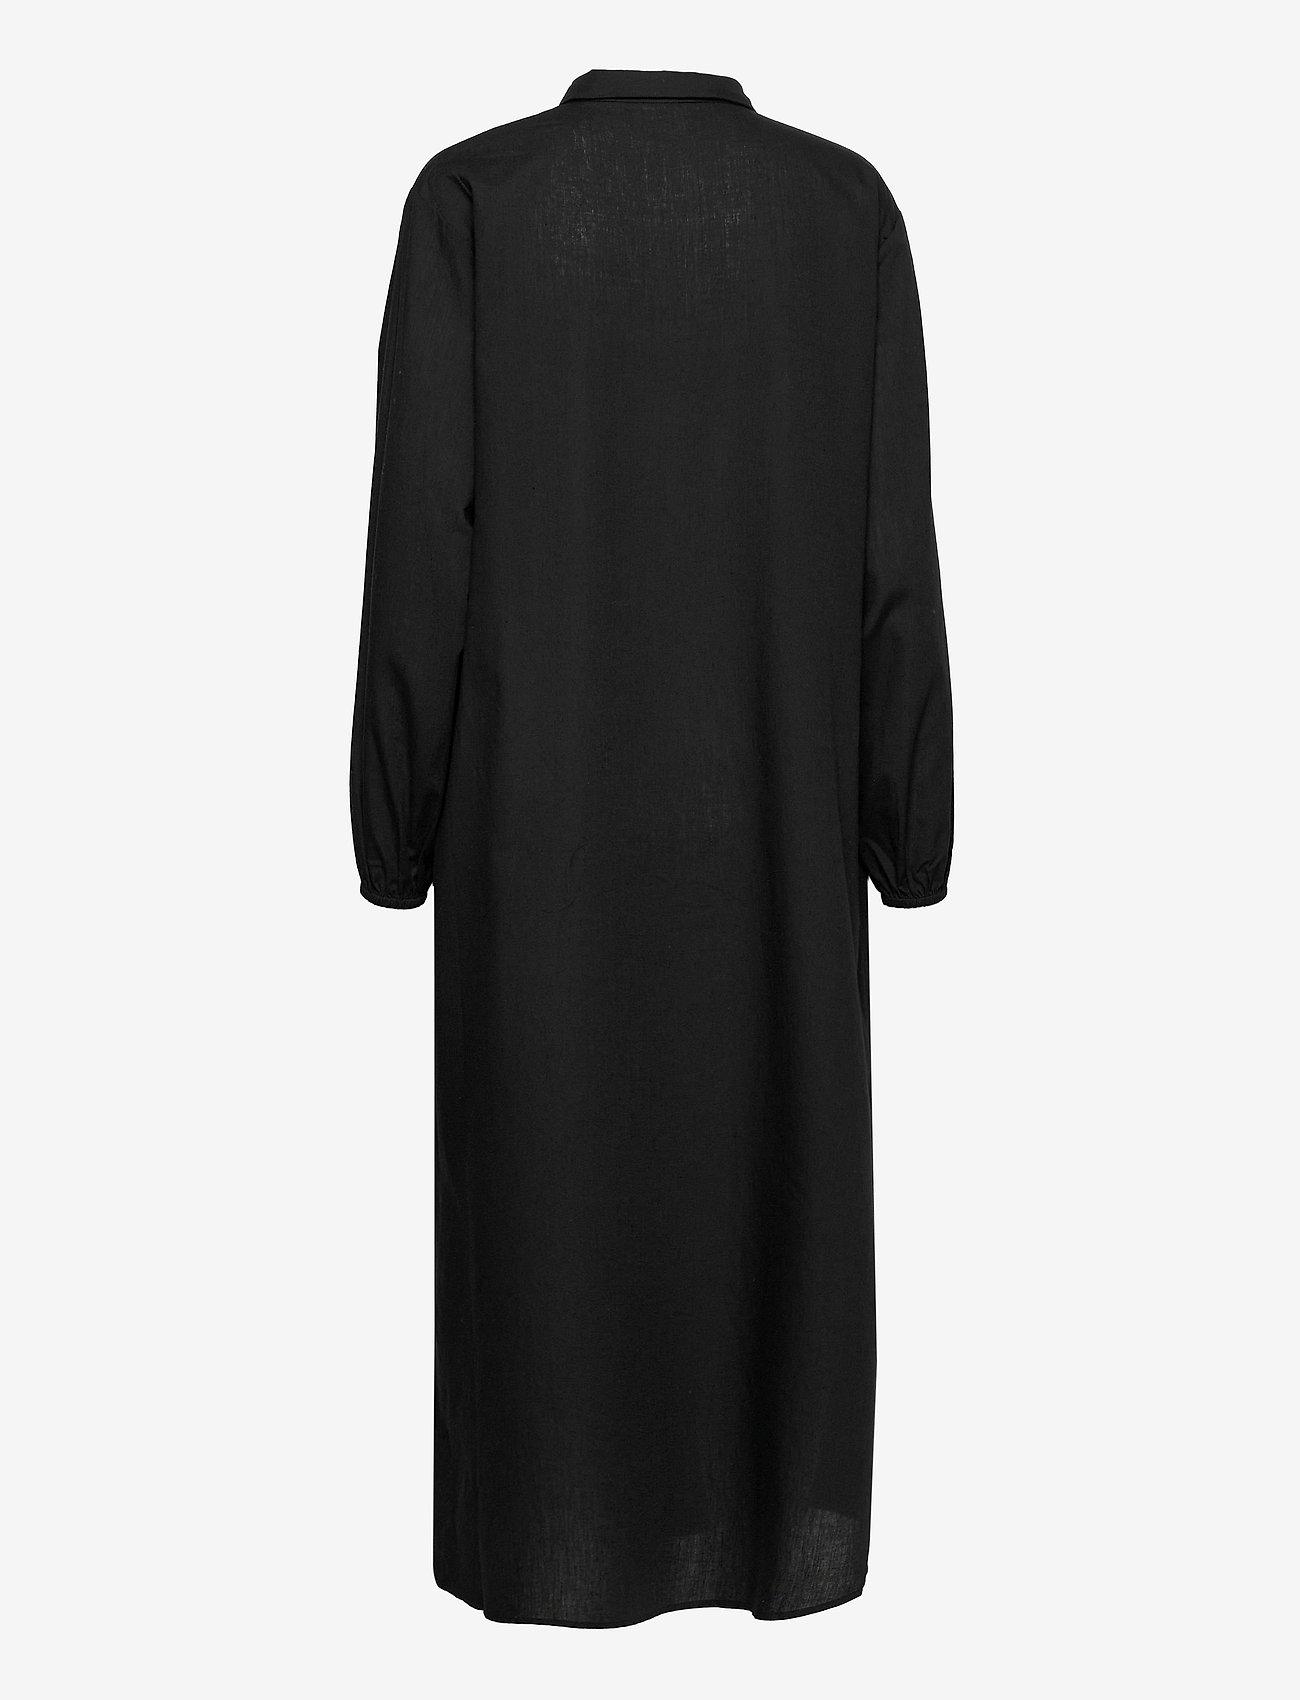 Stylein - SOUAL - maxi dresses - black - 2